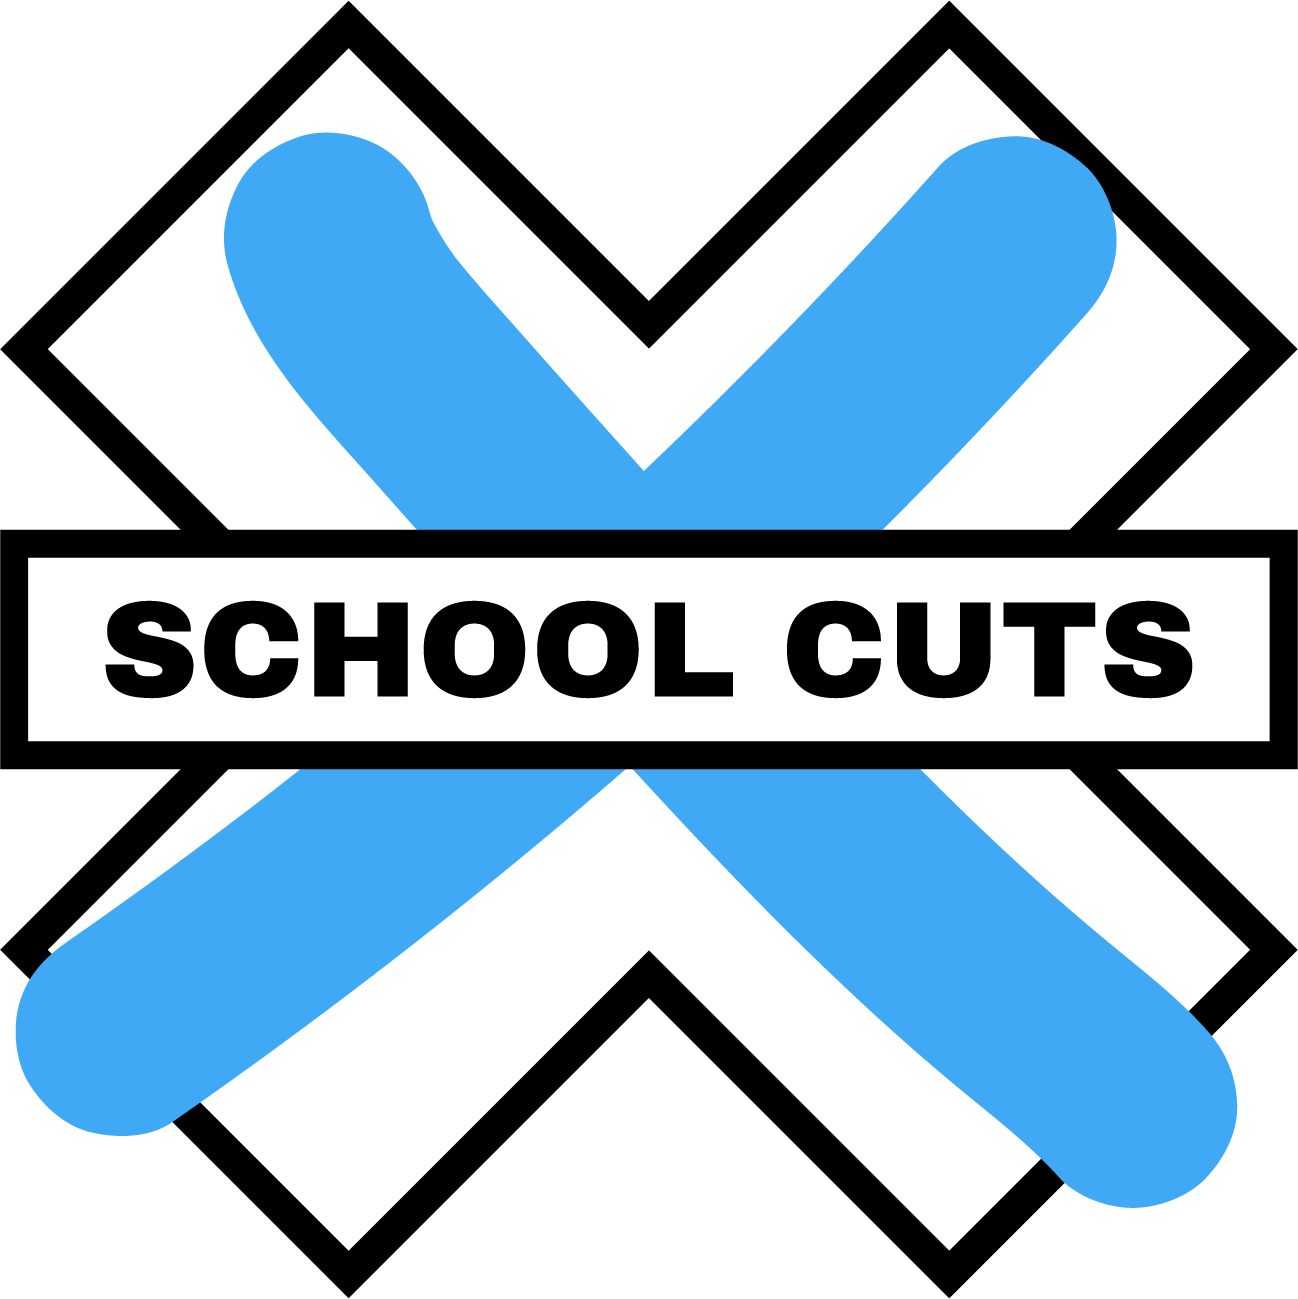 School Cuts